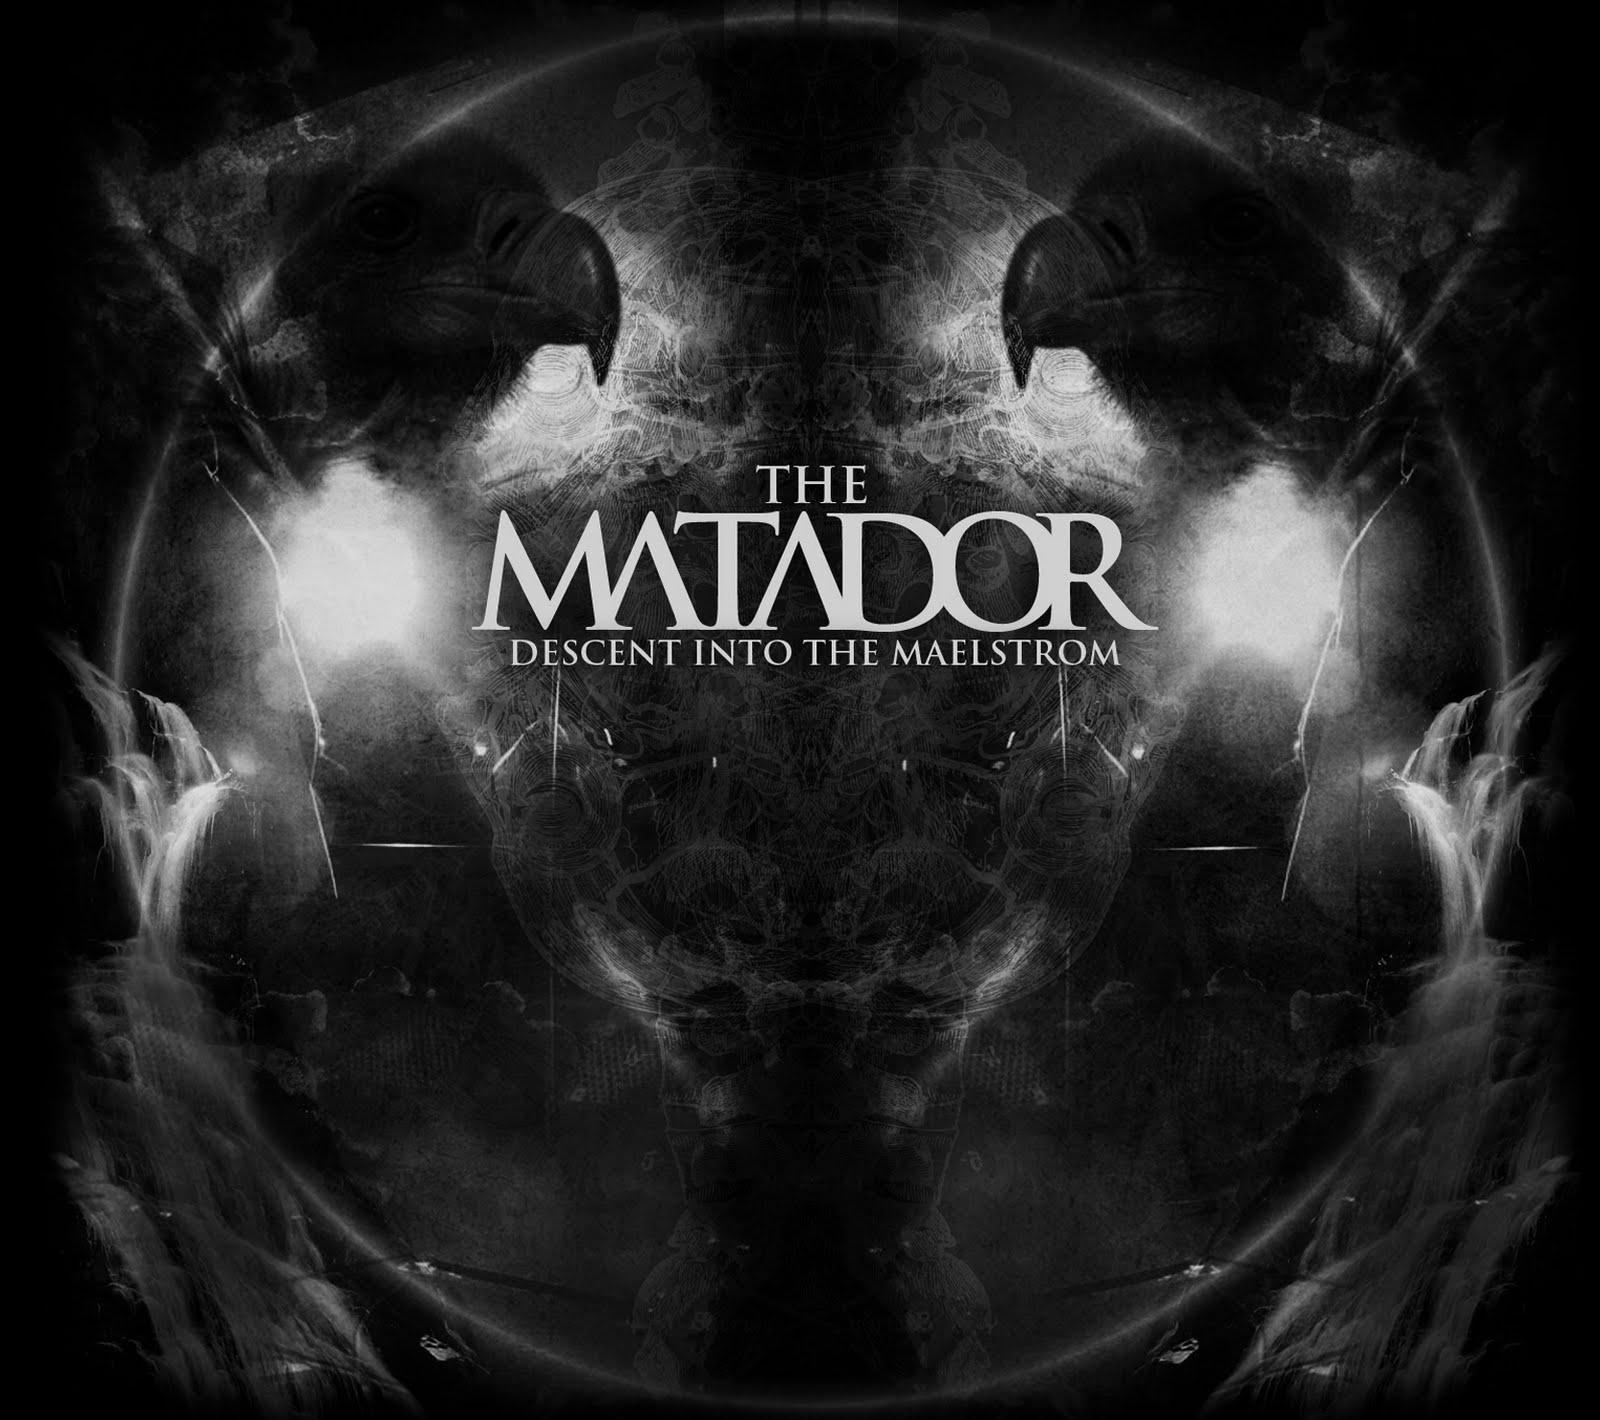 Five Feet Apart Poe: Album: The Matador - Descent Into The Maelstrom